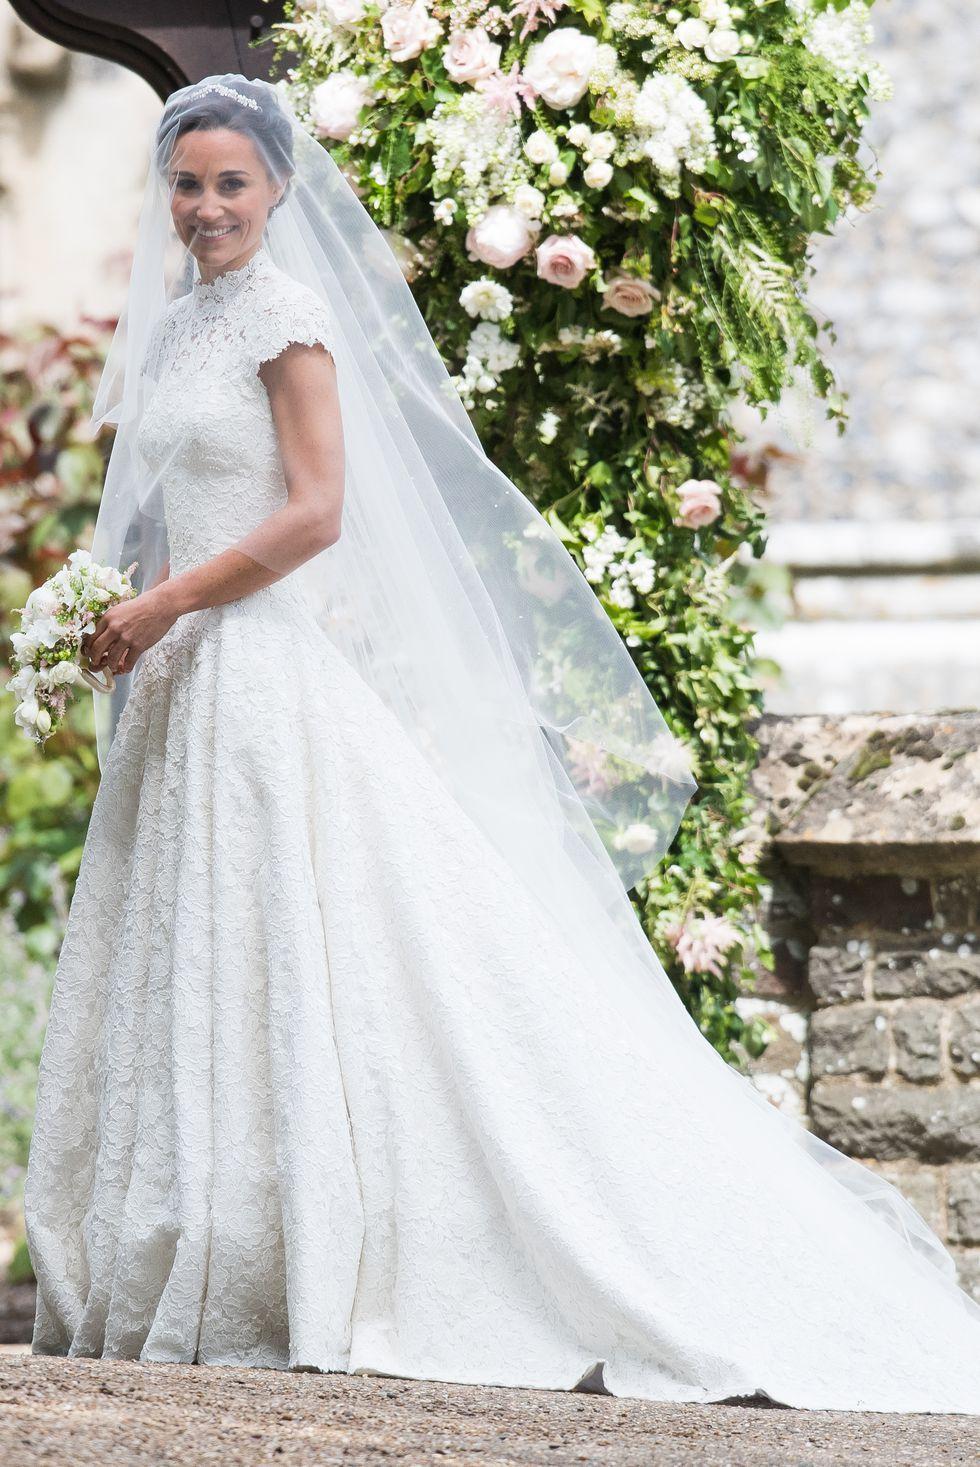 Big pretty wedding dresses   Gorgeous Royal Wedding Dresses to Shop for Your Big Day  Royal